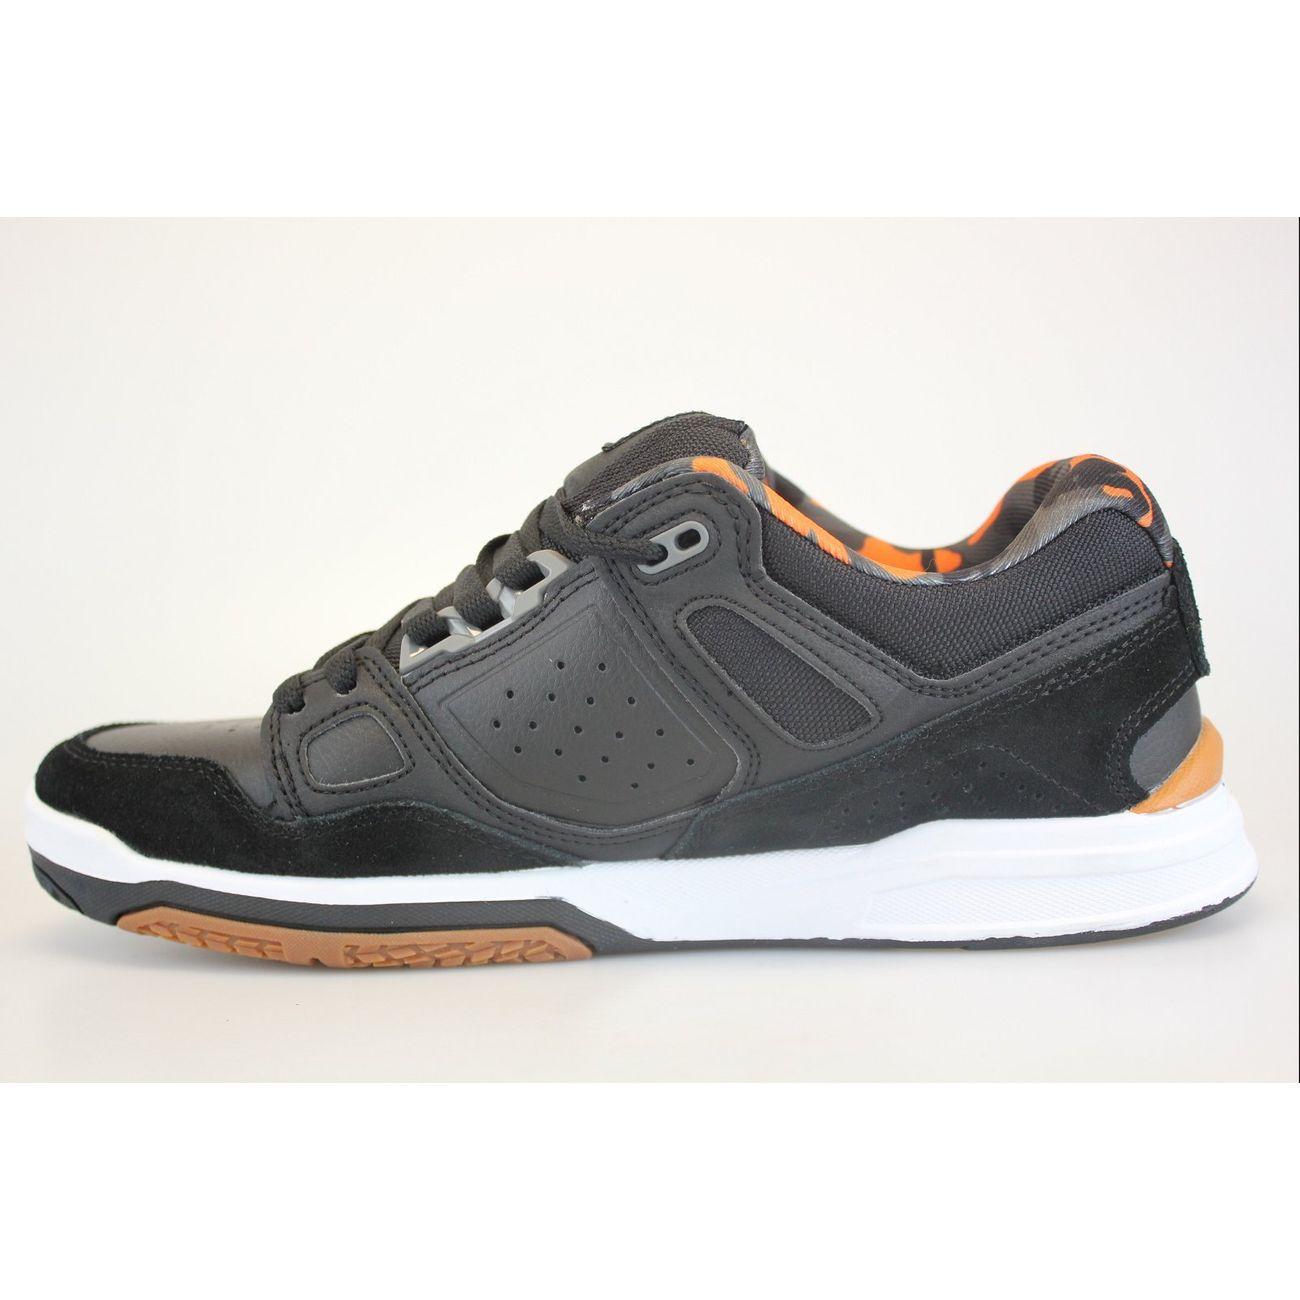 DC Shoes Tonik W, Sneakers Basses Femme, Vert (Olive), 41 EU